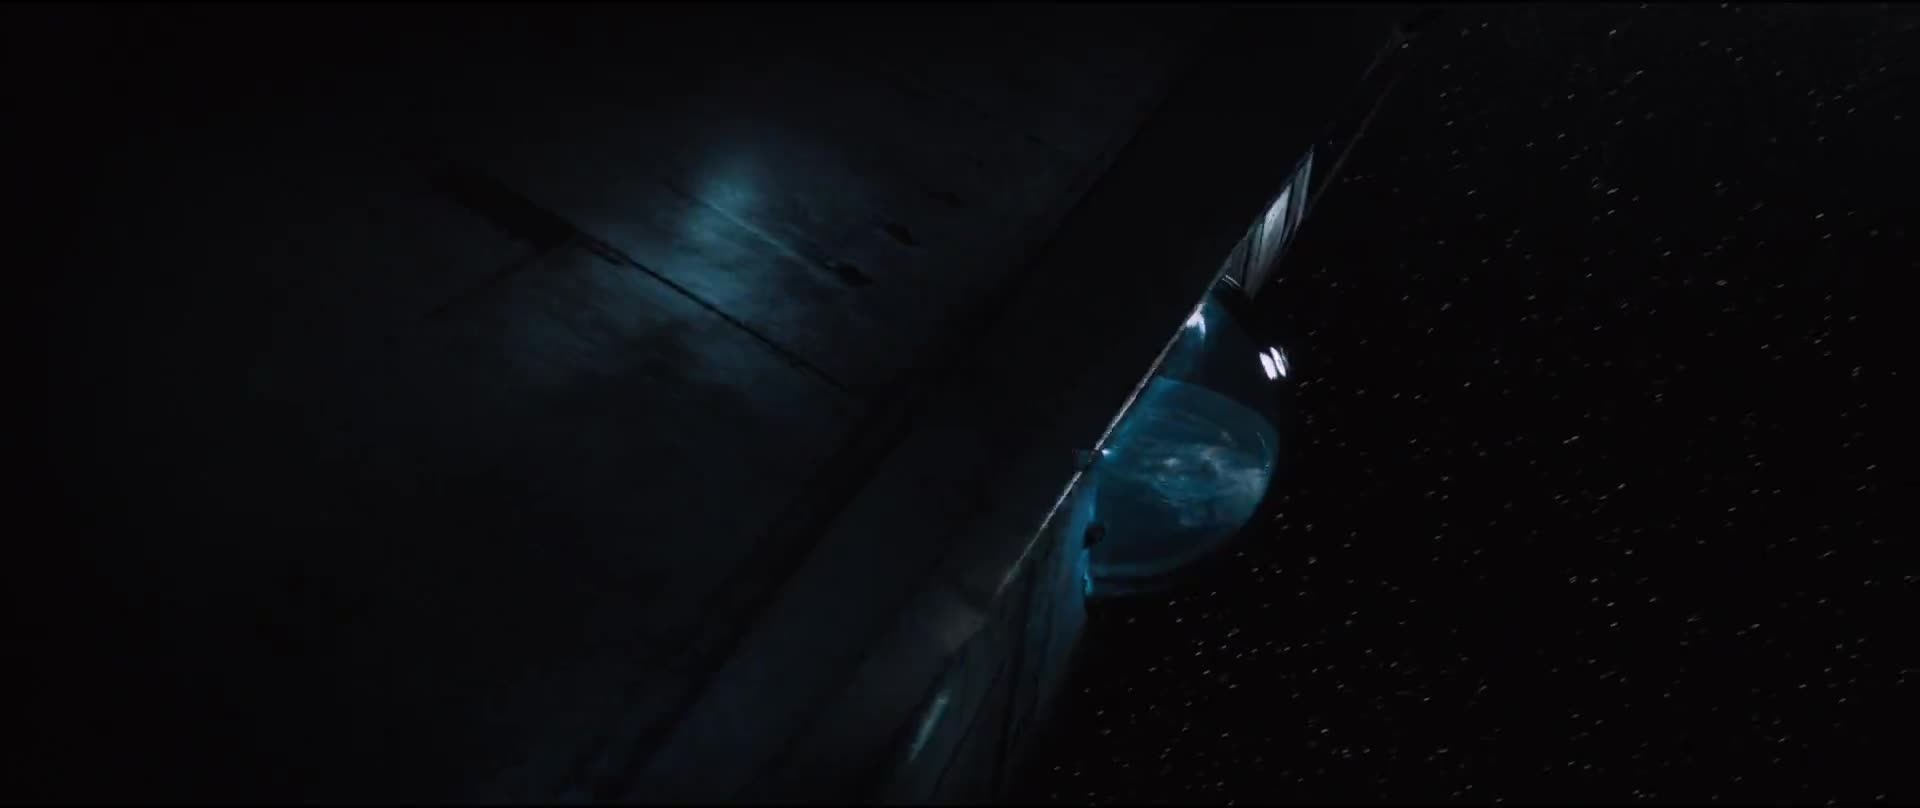 Jennifer Lawrence bikini scene from Passengers